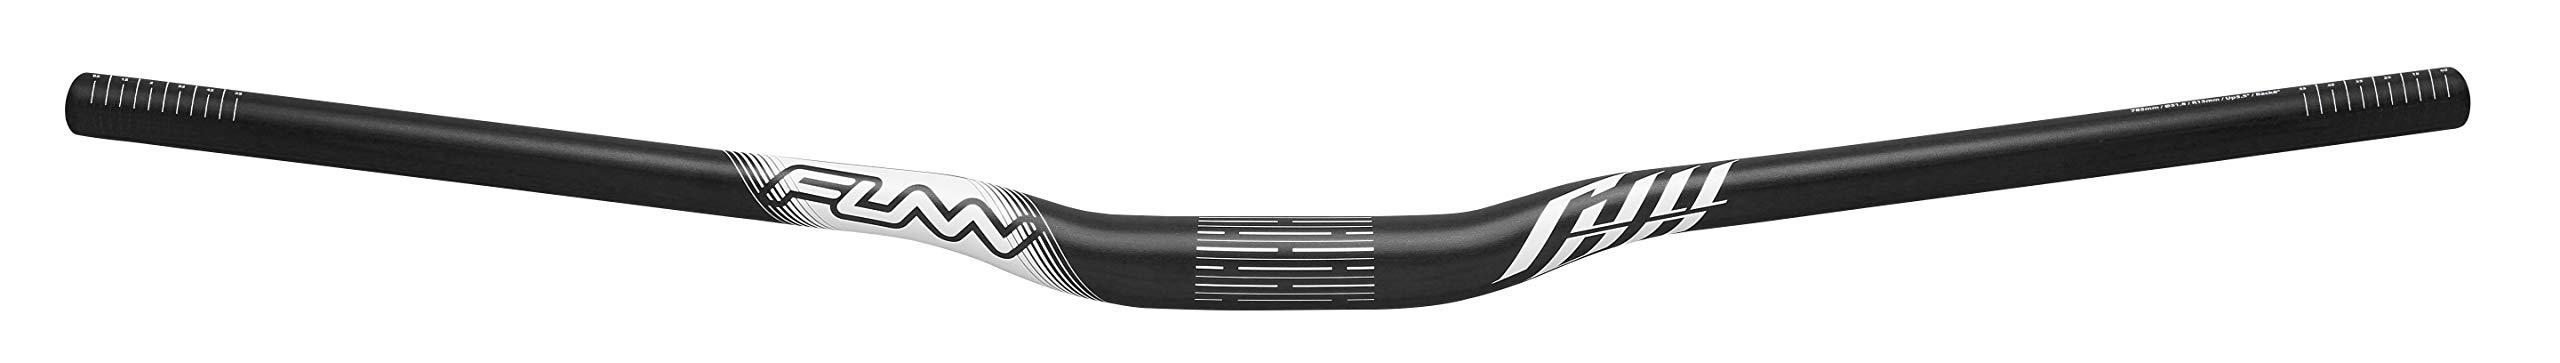 Full On MTB Handlebar, Bar Clamp 31.8mm, Width 785mm (Rise 15mm, Black) by Funn